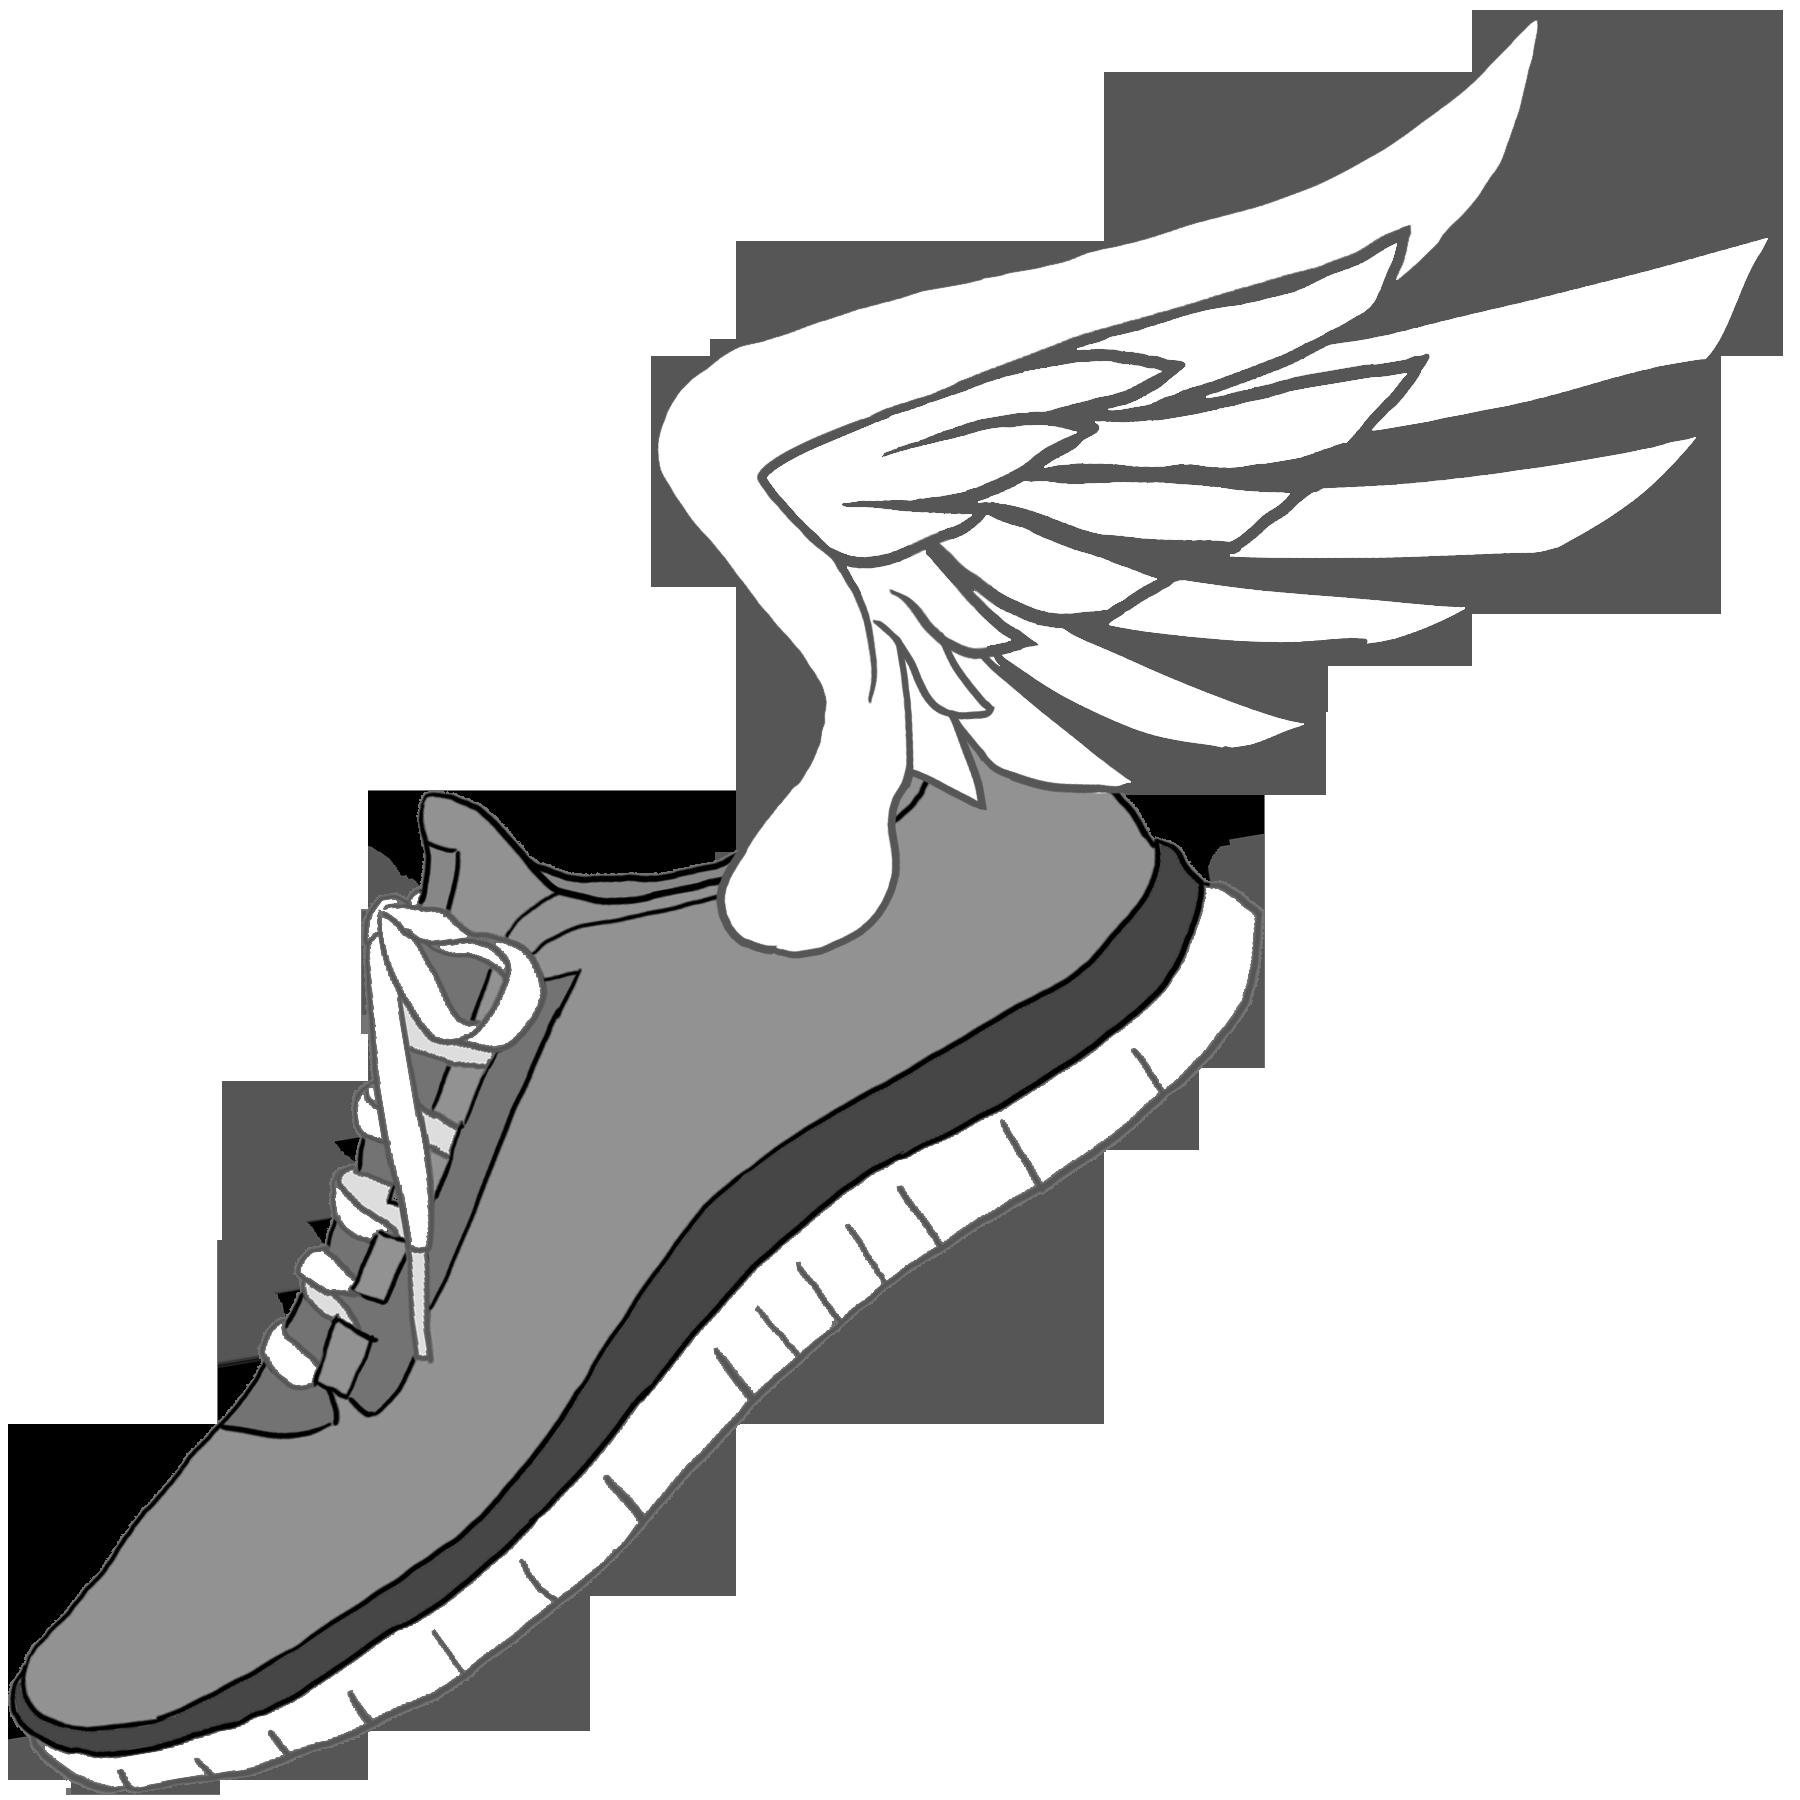 1800x1800 Wings Clipart Running Shoe